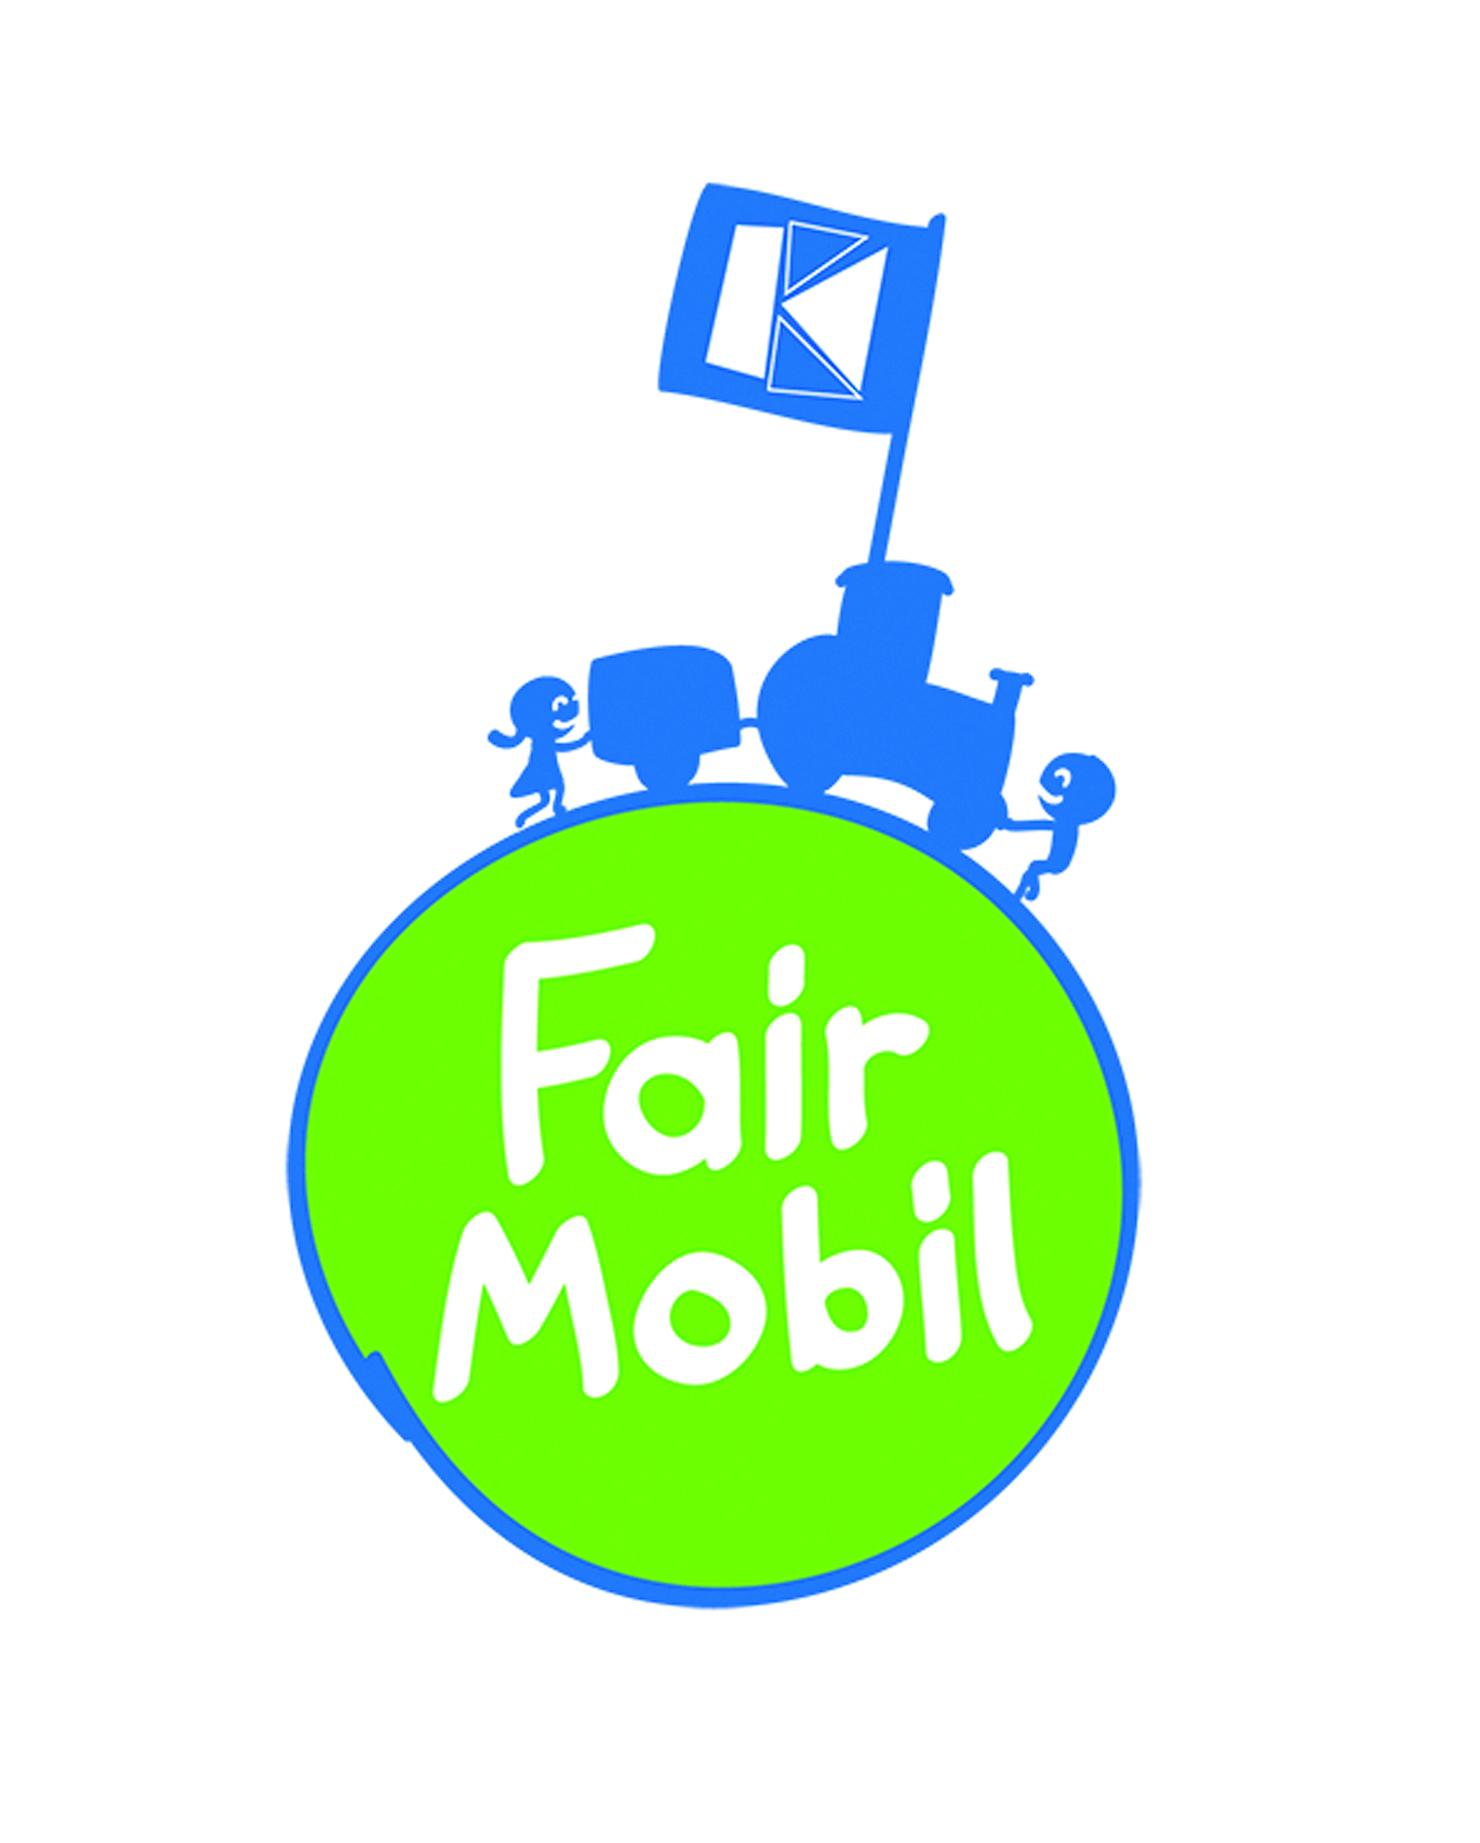 Spenden fürs FairMobil